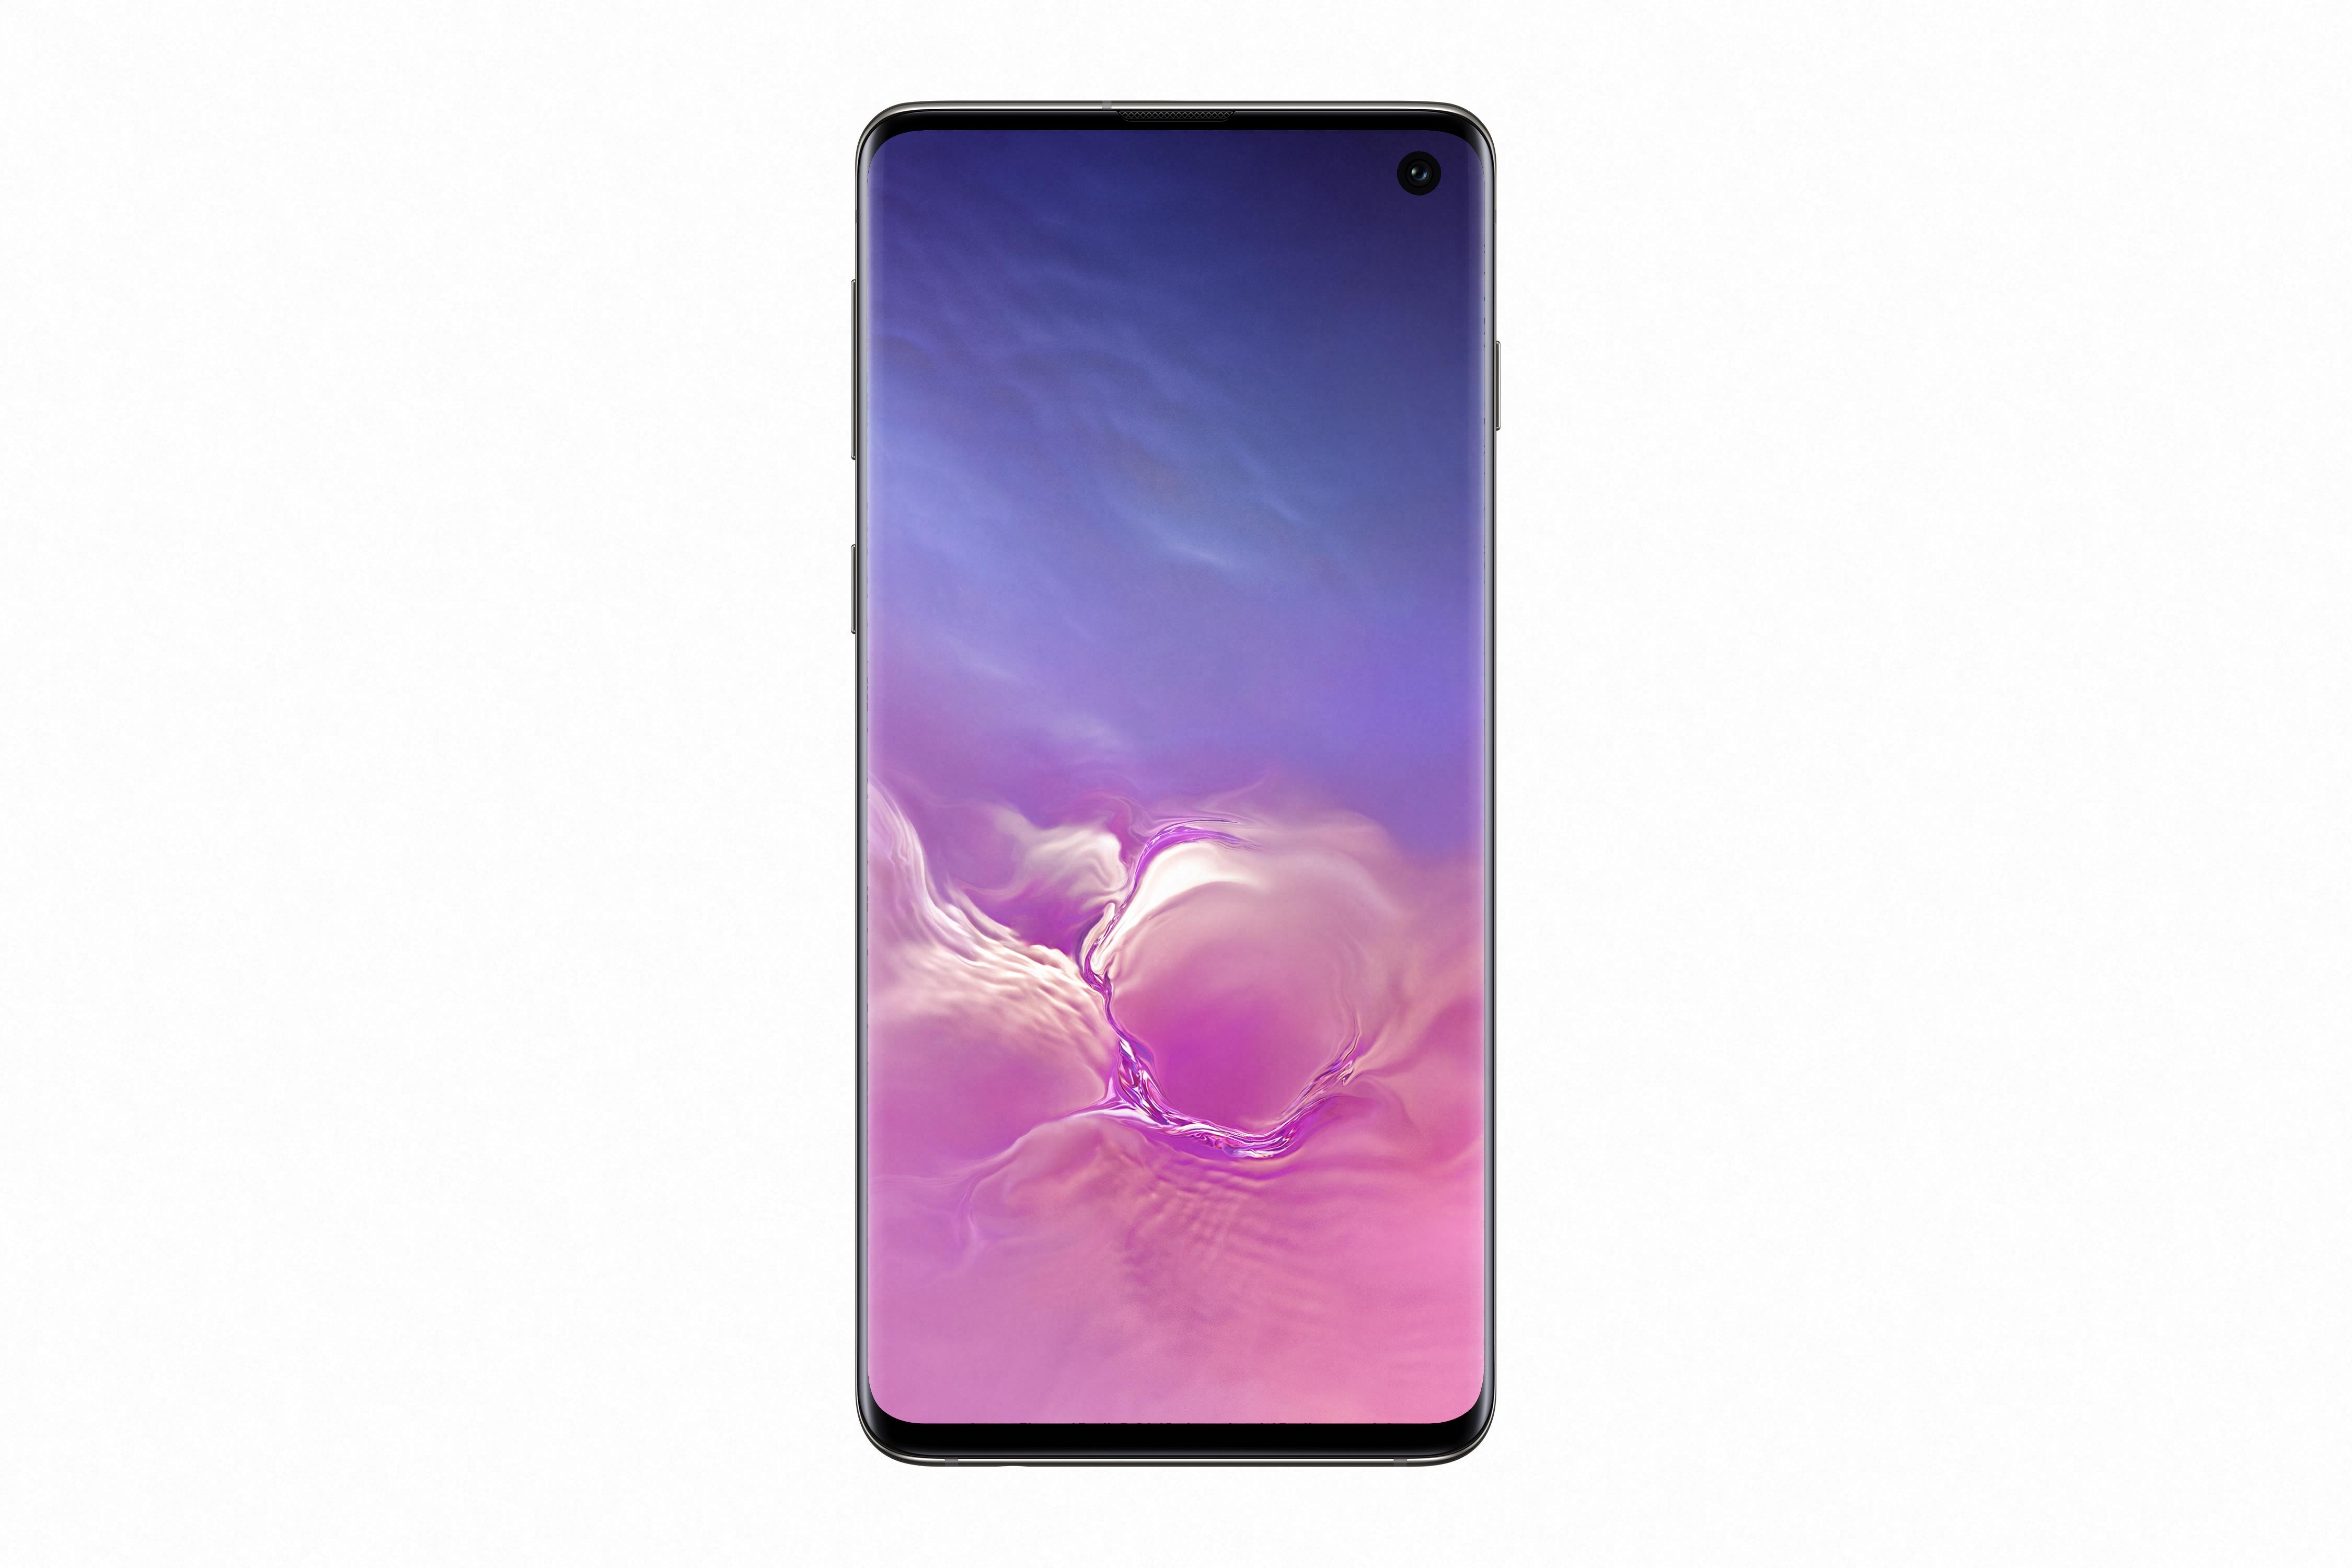 Telefon Mobil Samsung Galaxy S10 G973 128GB Flash 8GB RAM Dual SIM 4G Gradation Black